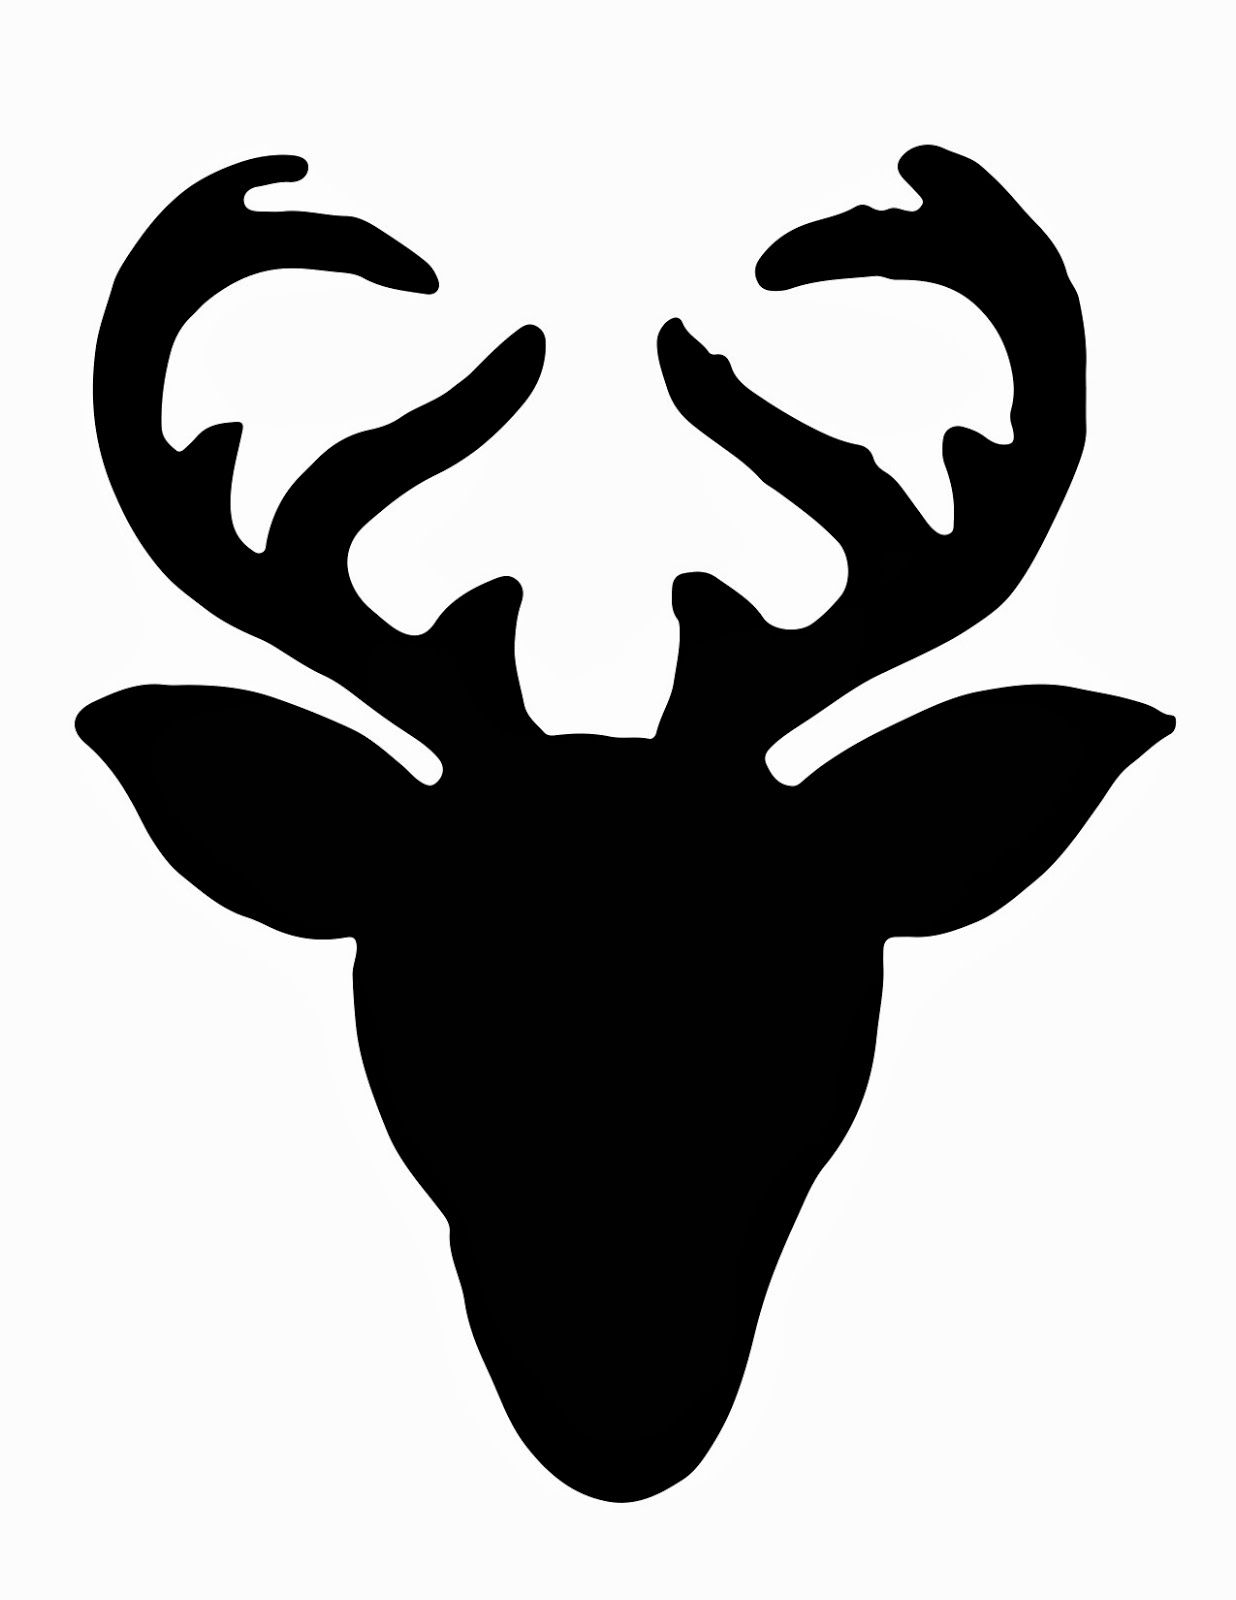 1236x1600 Reindeer Head Silhouette Clipart Best Clipart Best Christmas